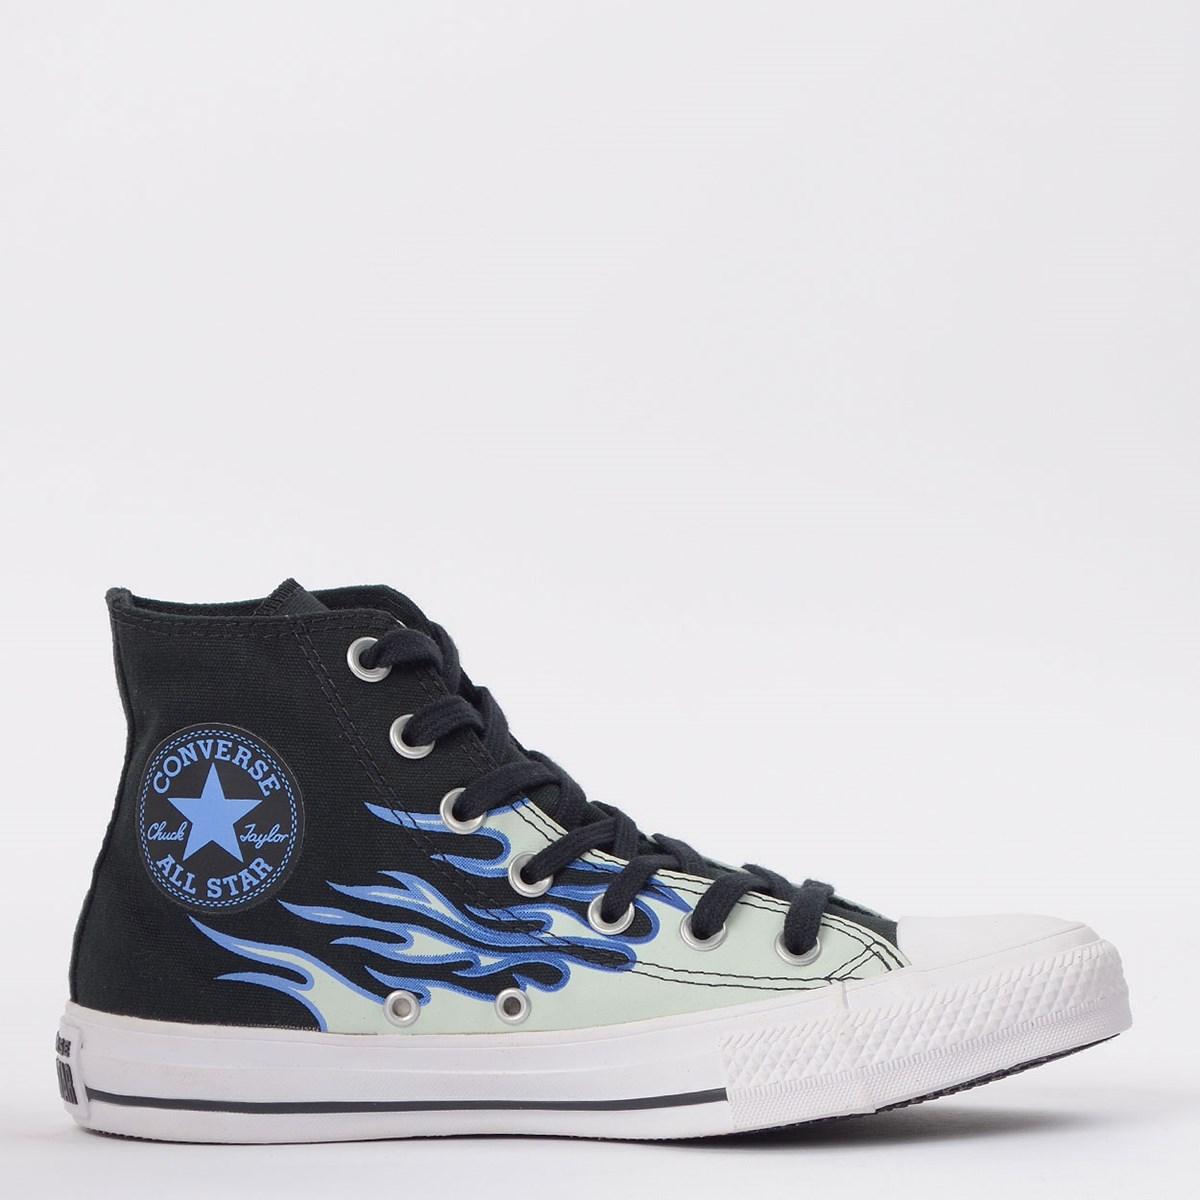 Tênis Converse Chuck Taylor All Star Flame Hi Preto Azul CT15130001